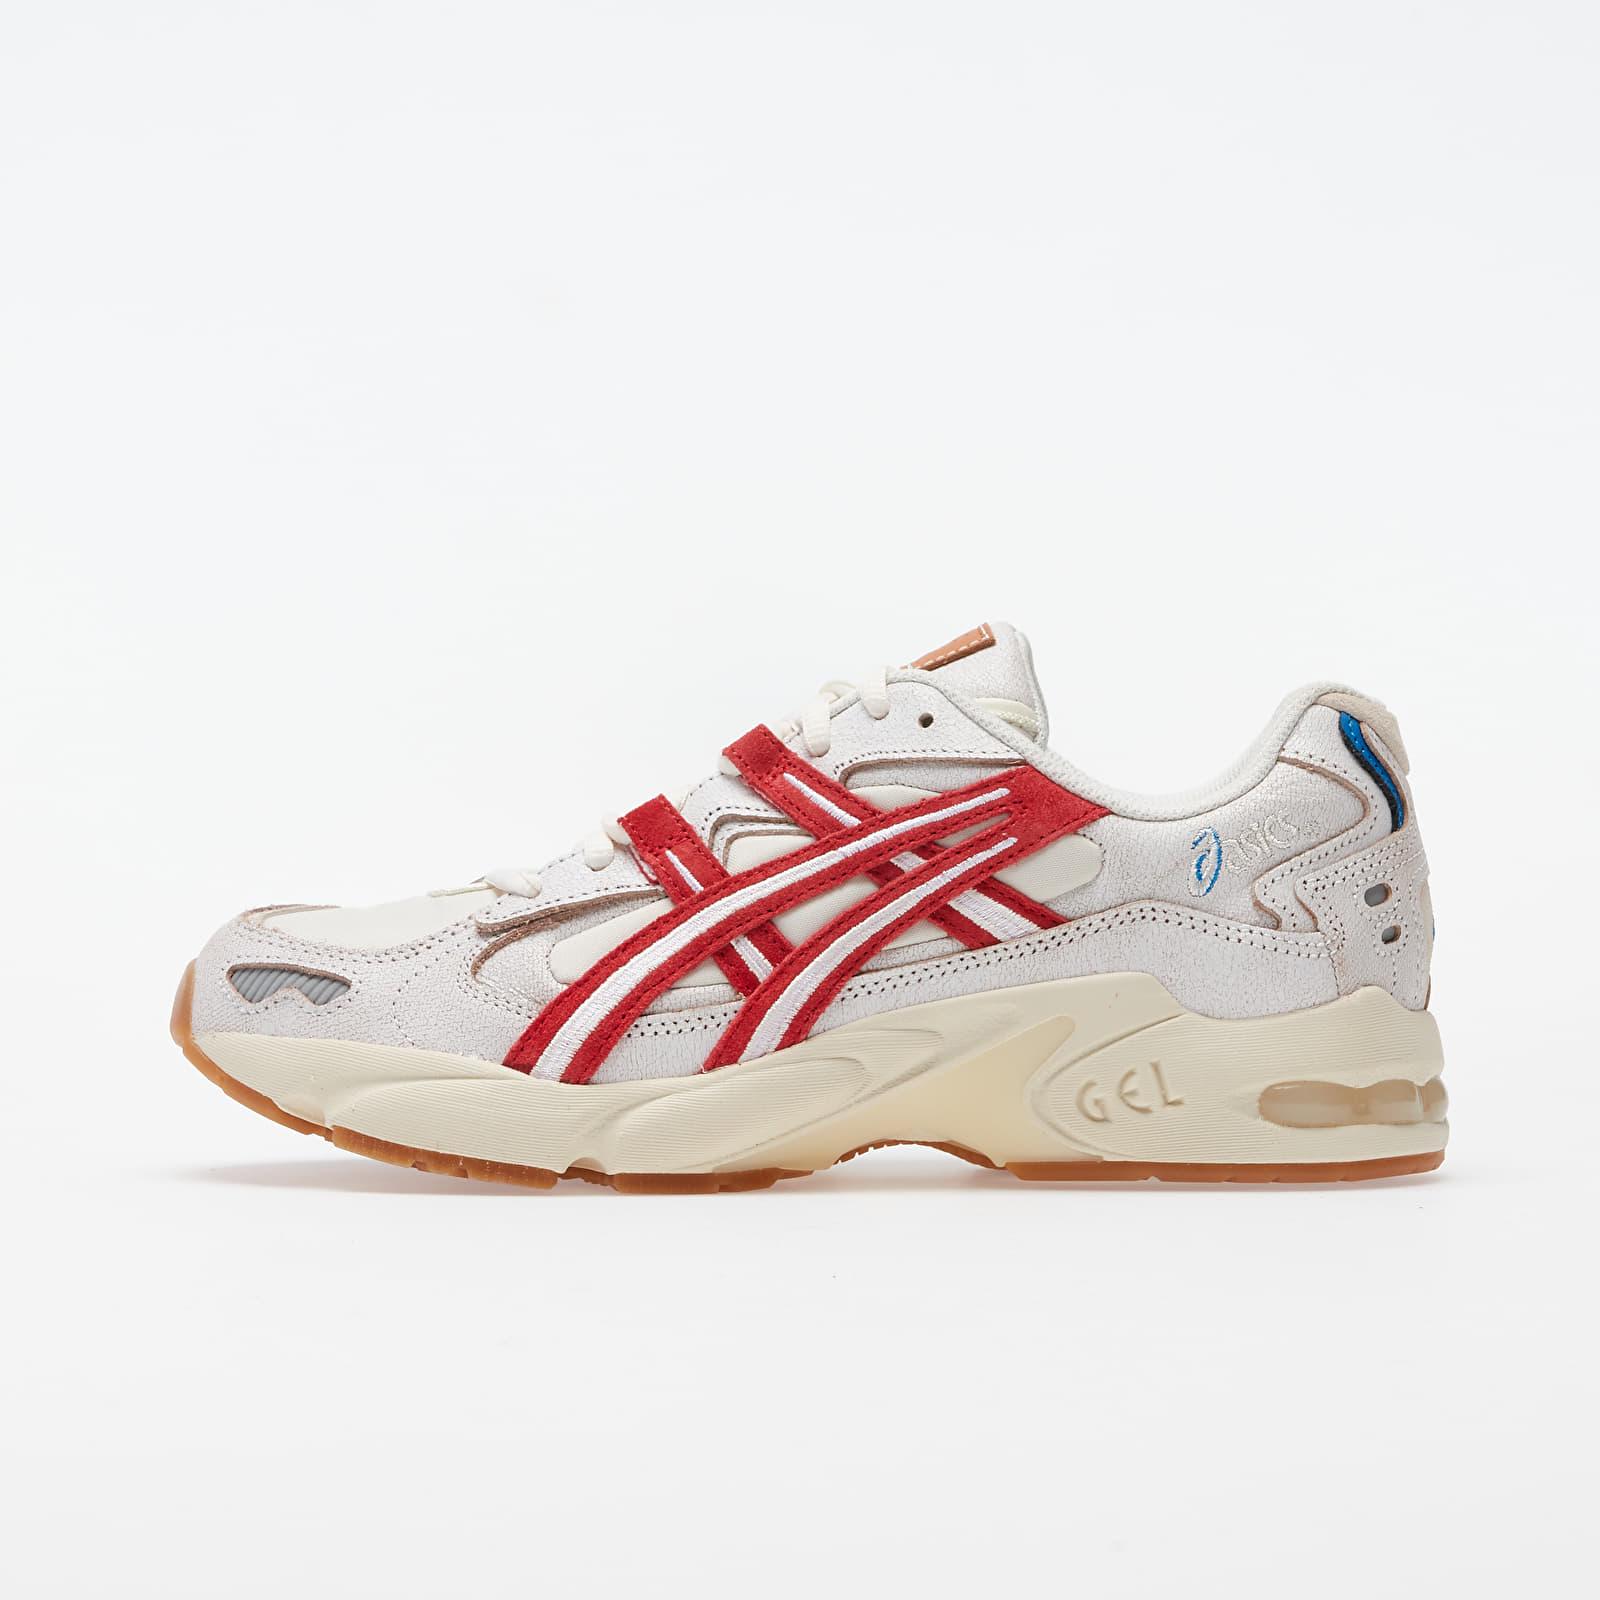 Pánské tenisky a boty Asics Gel Kayano 5 OG Cream/ Classic Red